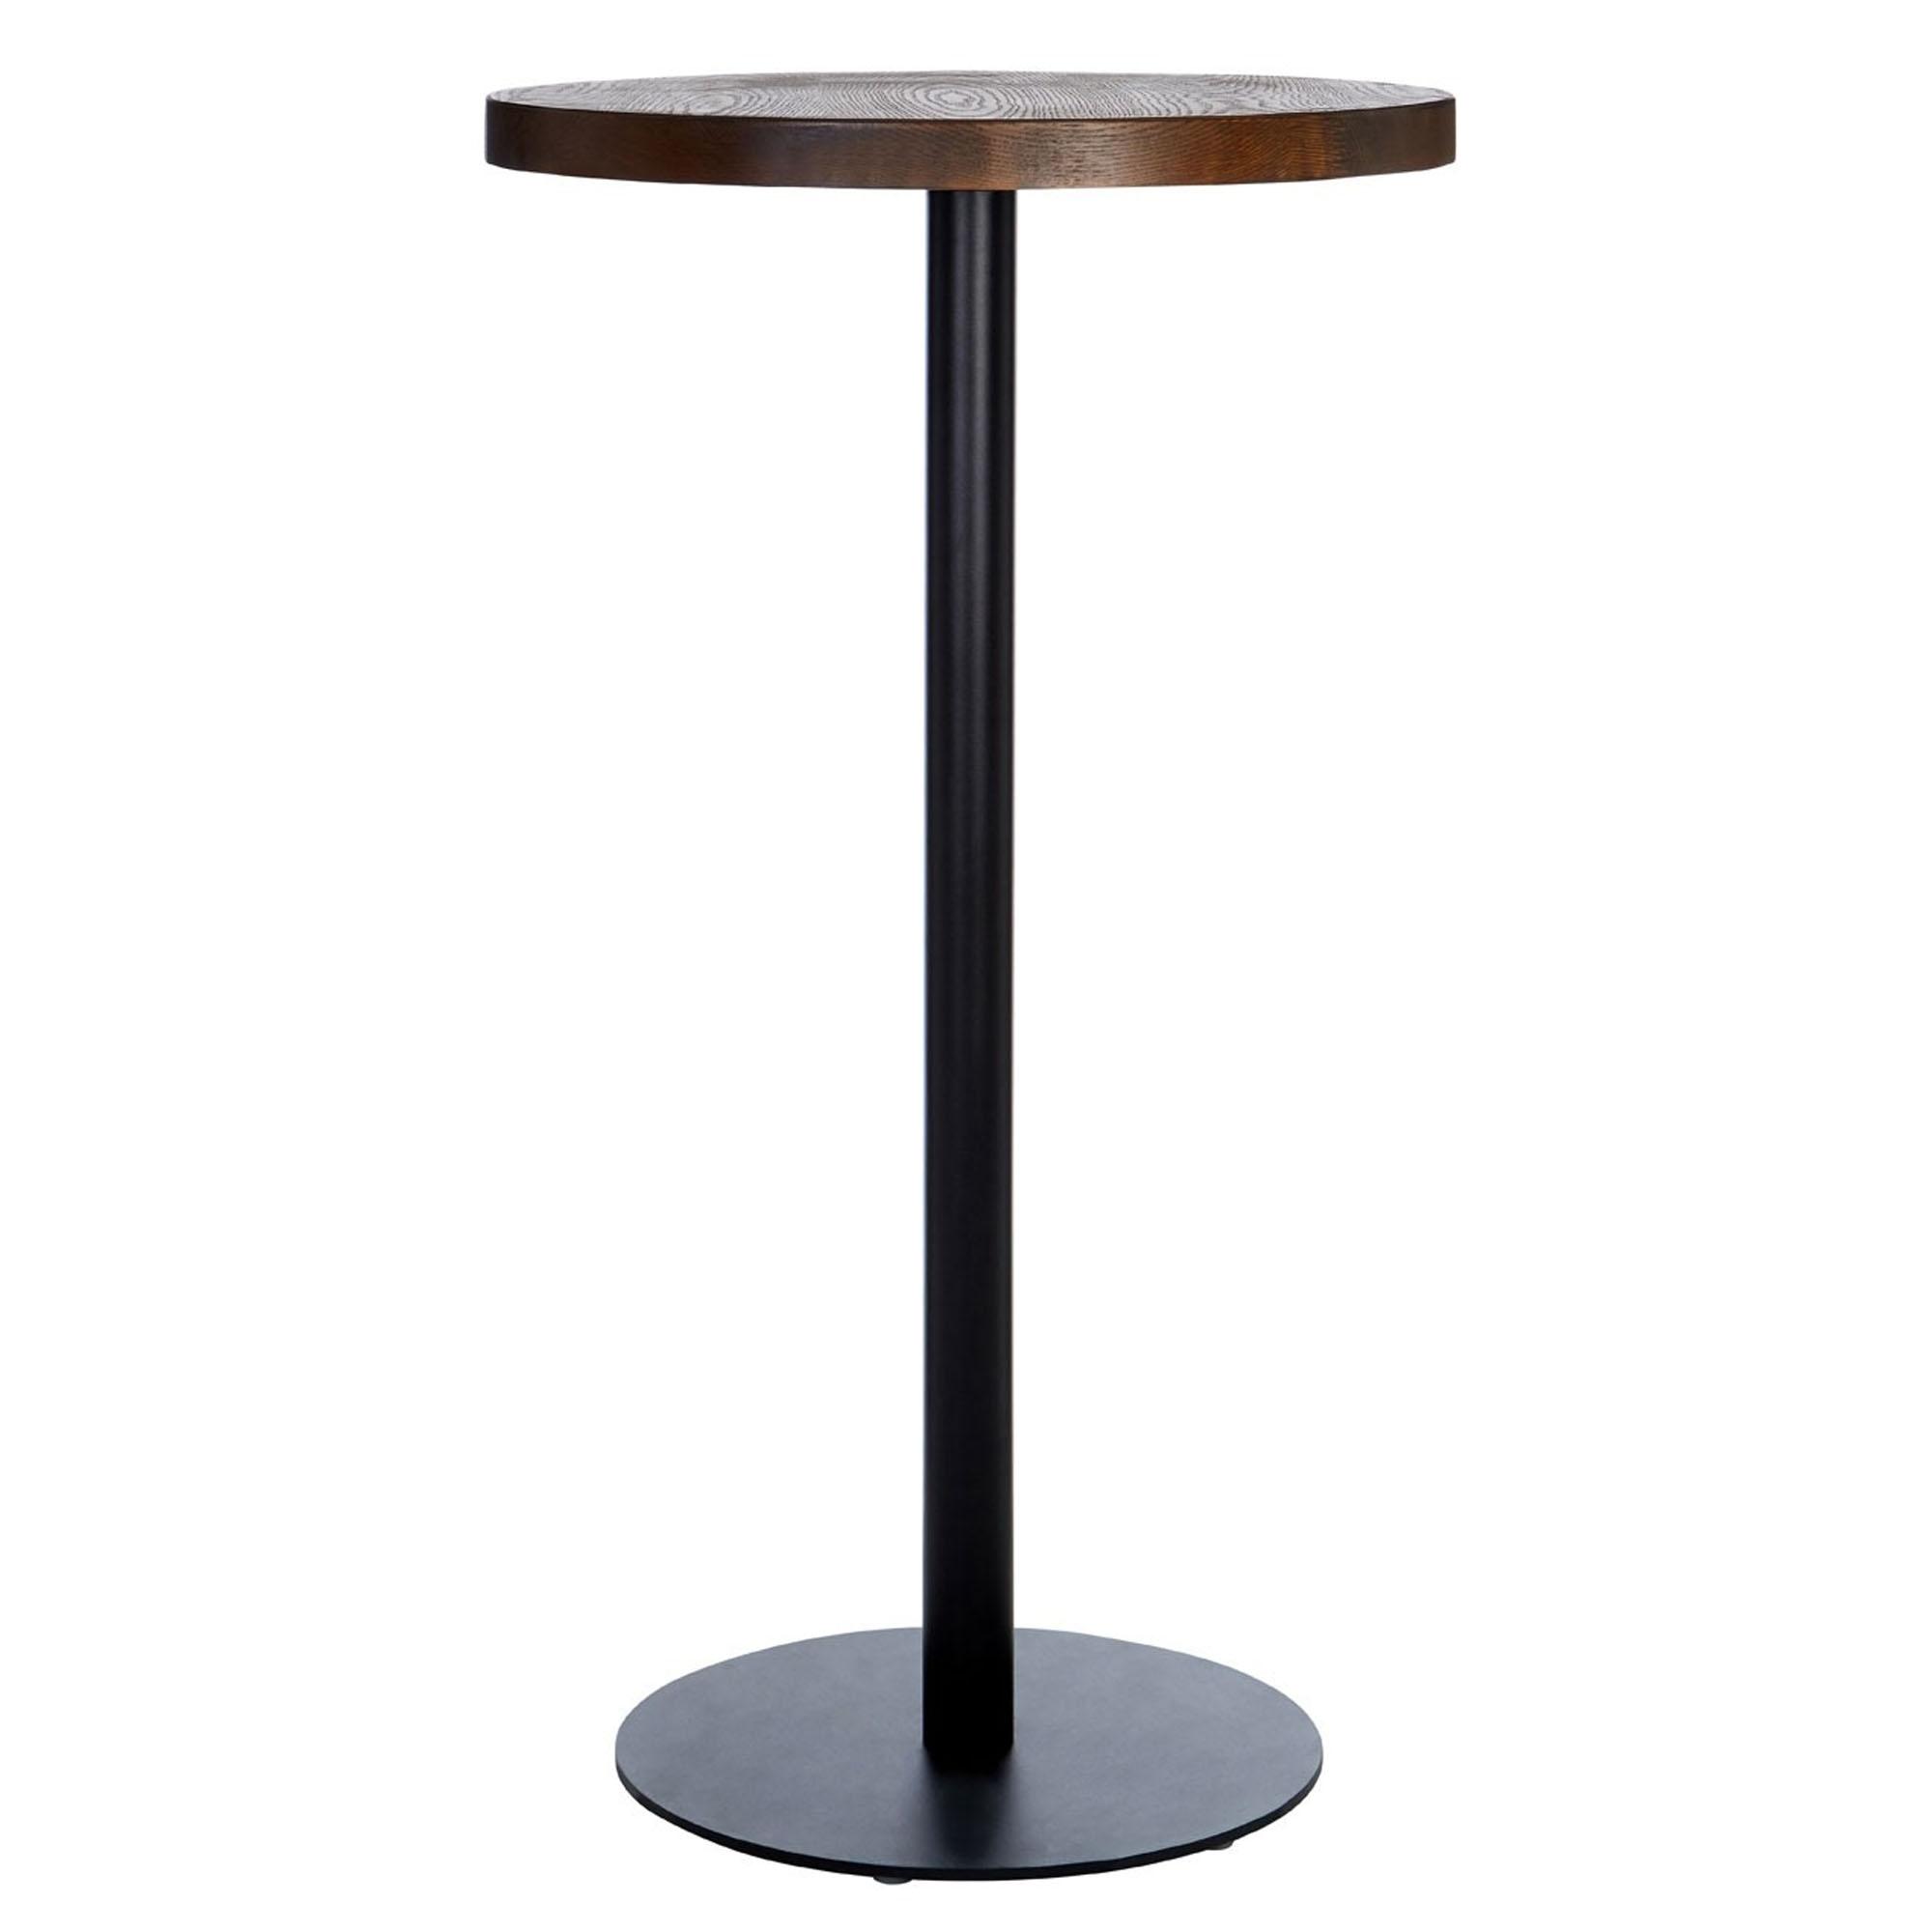 Dalston walnut rubberwood table